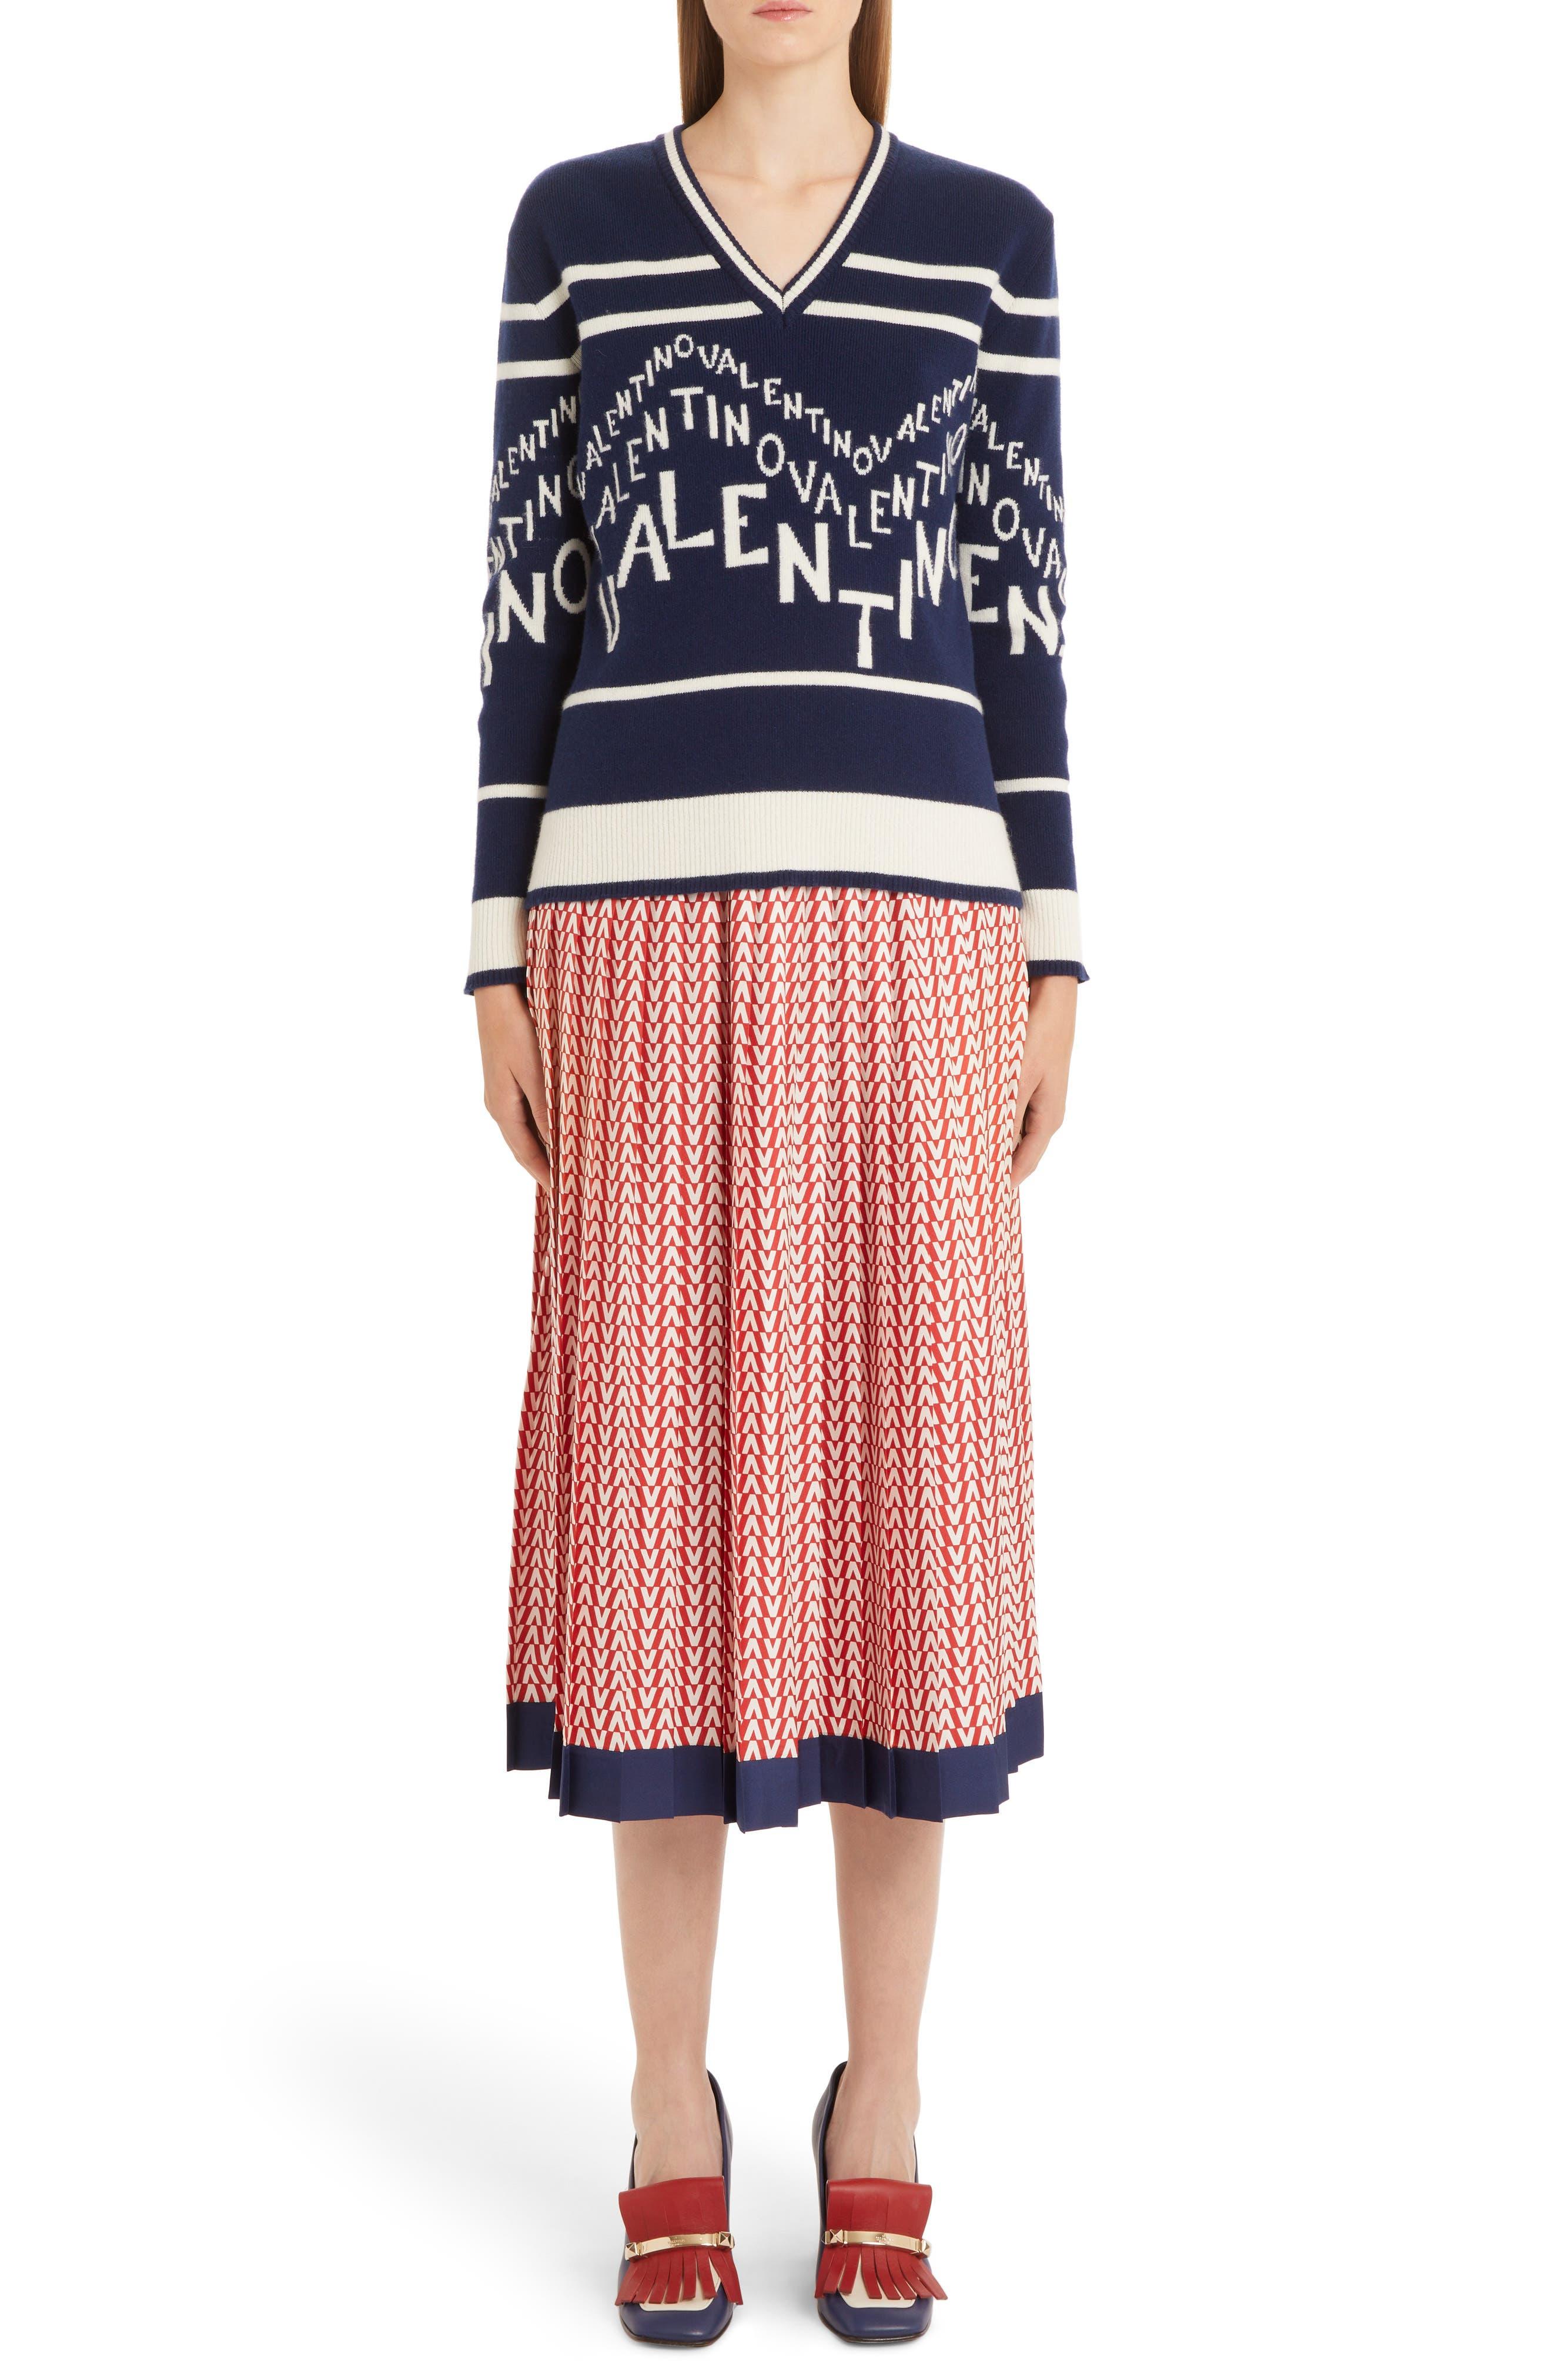 VALENTINO,                             Chevron Logo Wool & Cashmere Sweater,                             Alternate thumbnail 6, color,                             ALMOND/ PURE BLUE